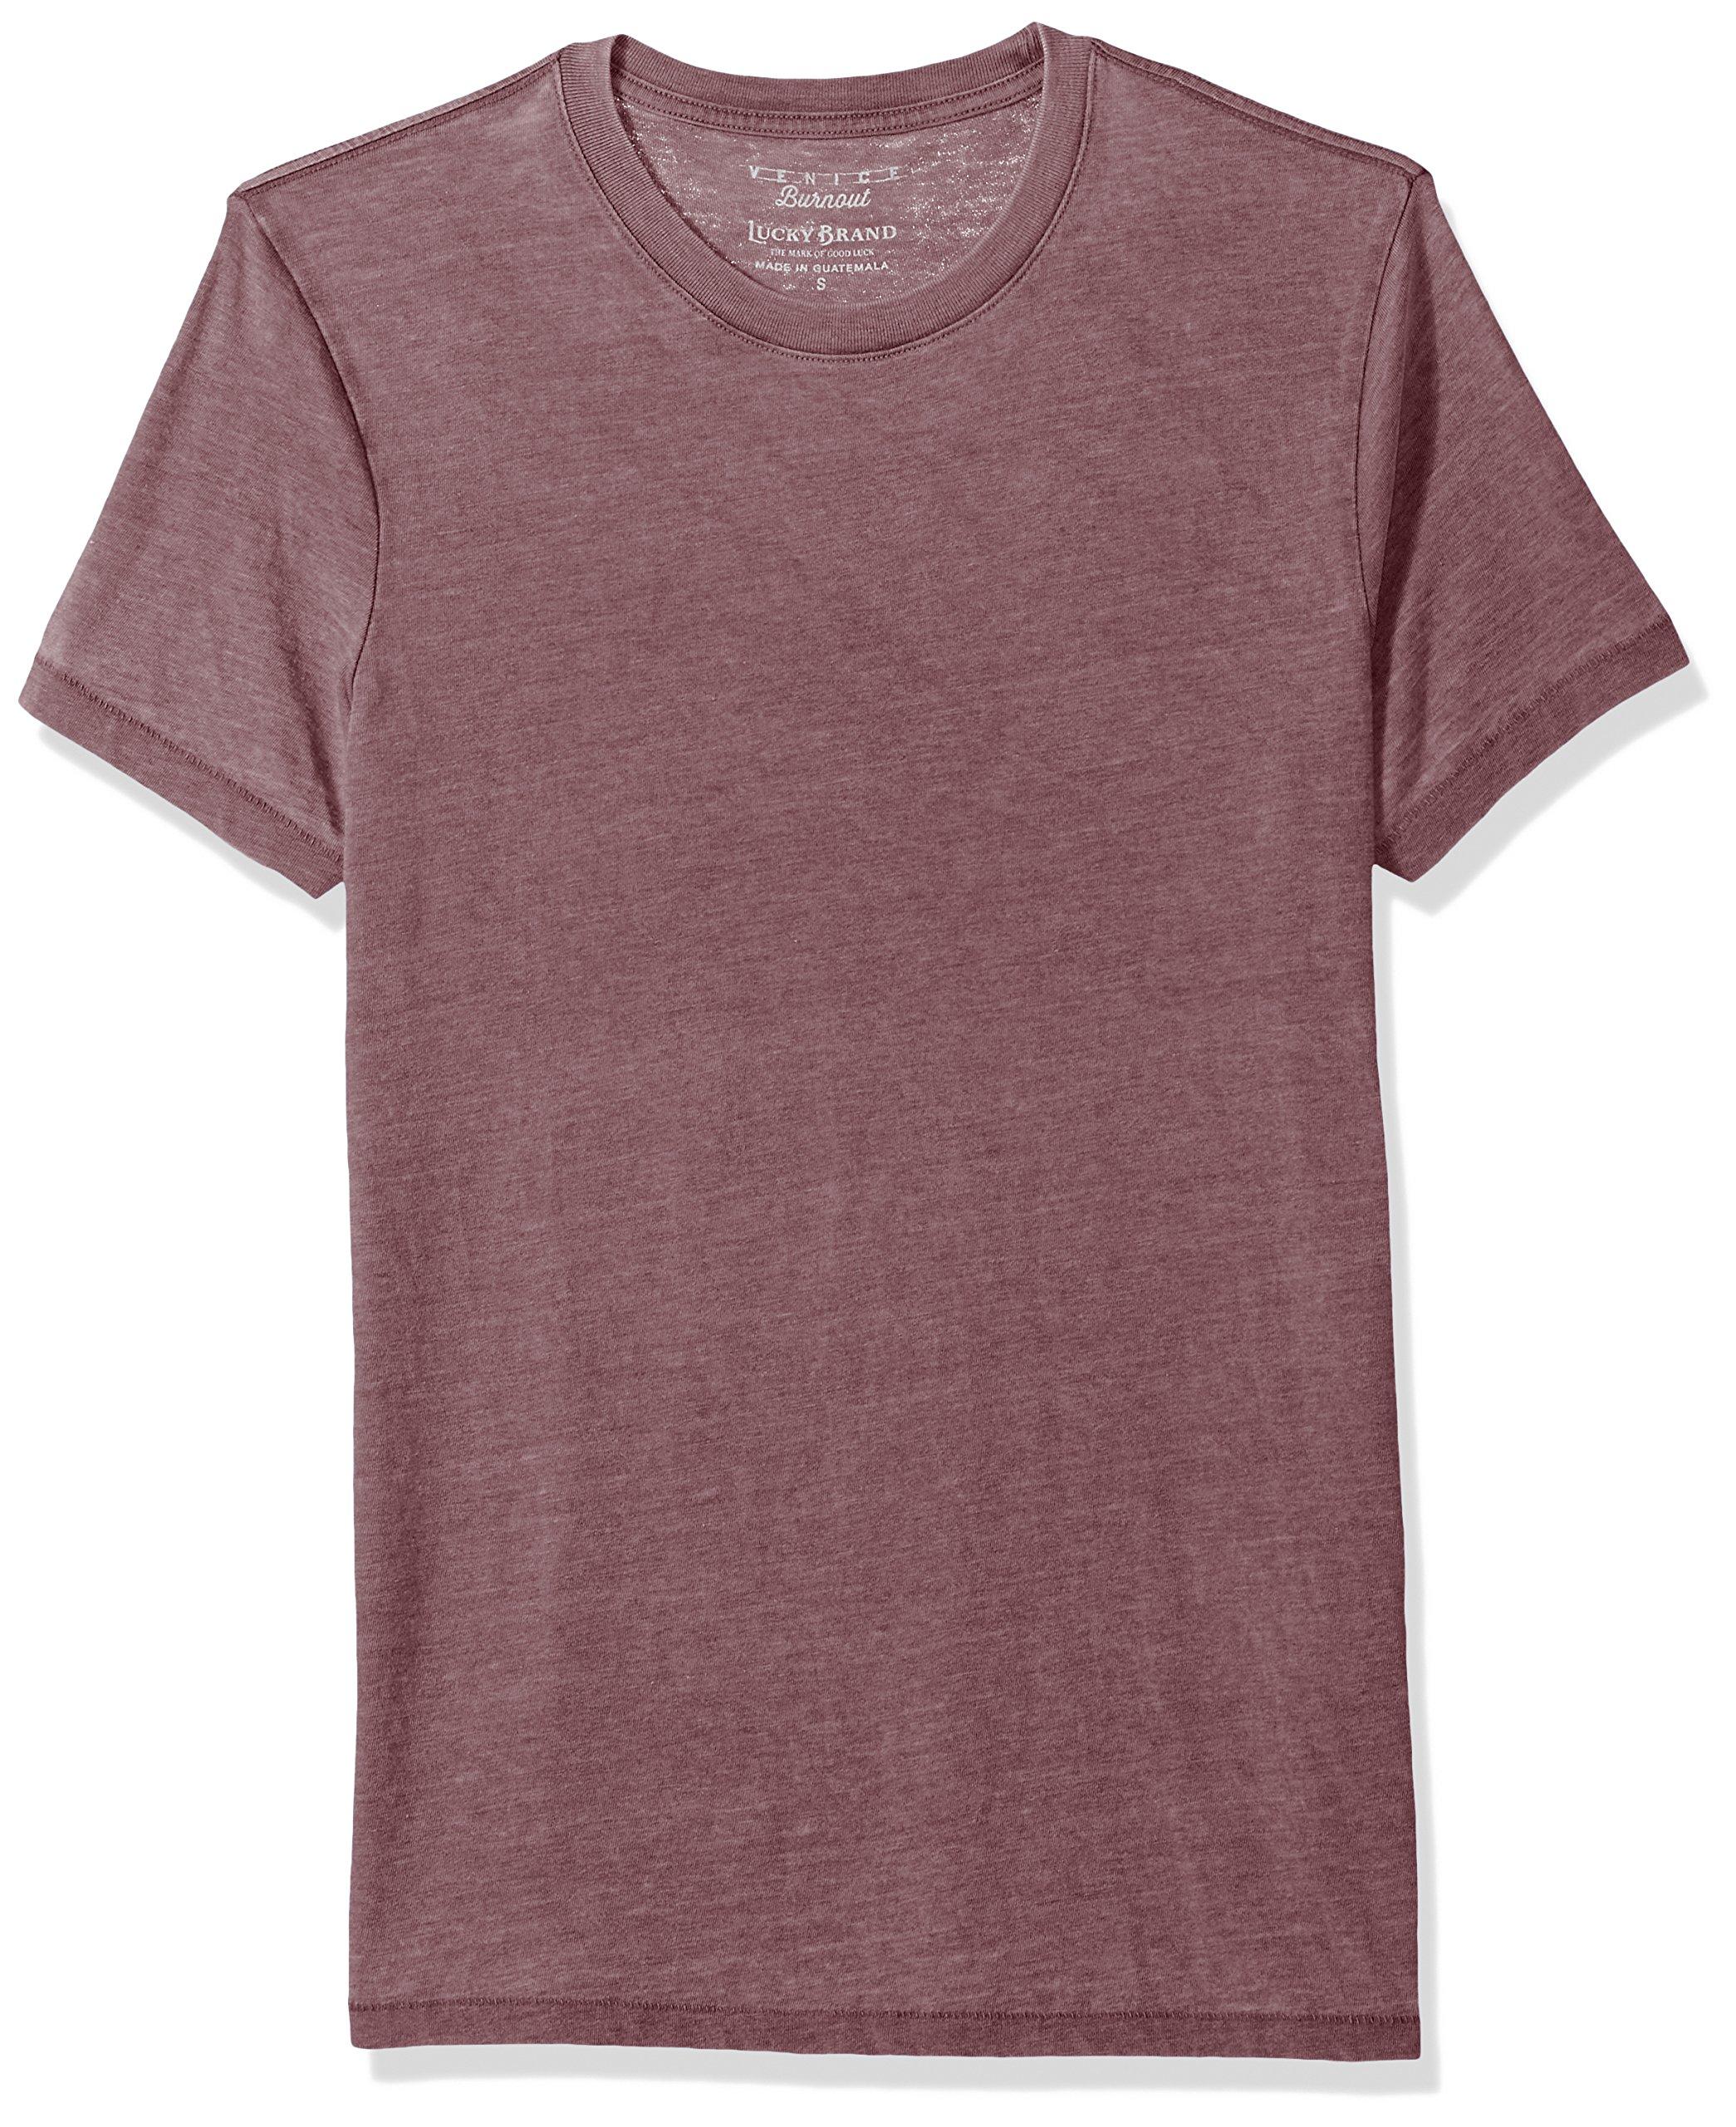 Lucky Brand Men's Venice Burnout Crew Neck Tee Shirt, Port Royale, XL